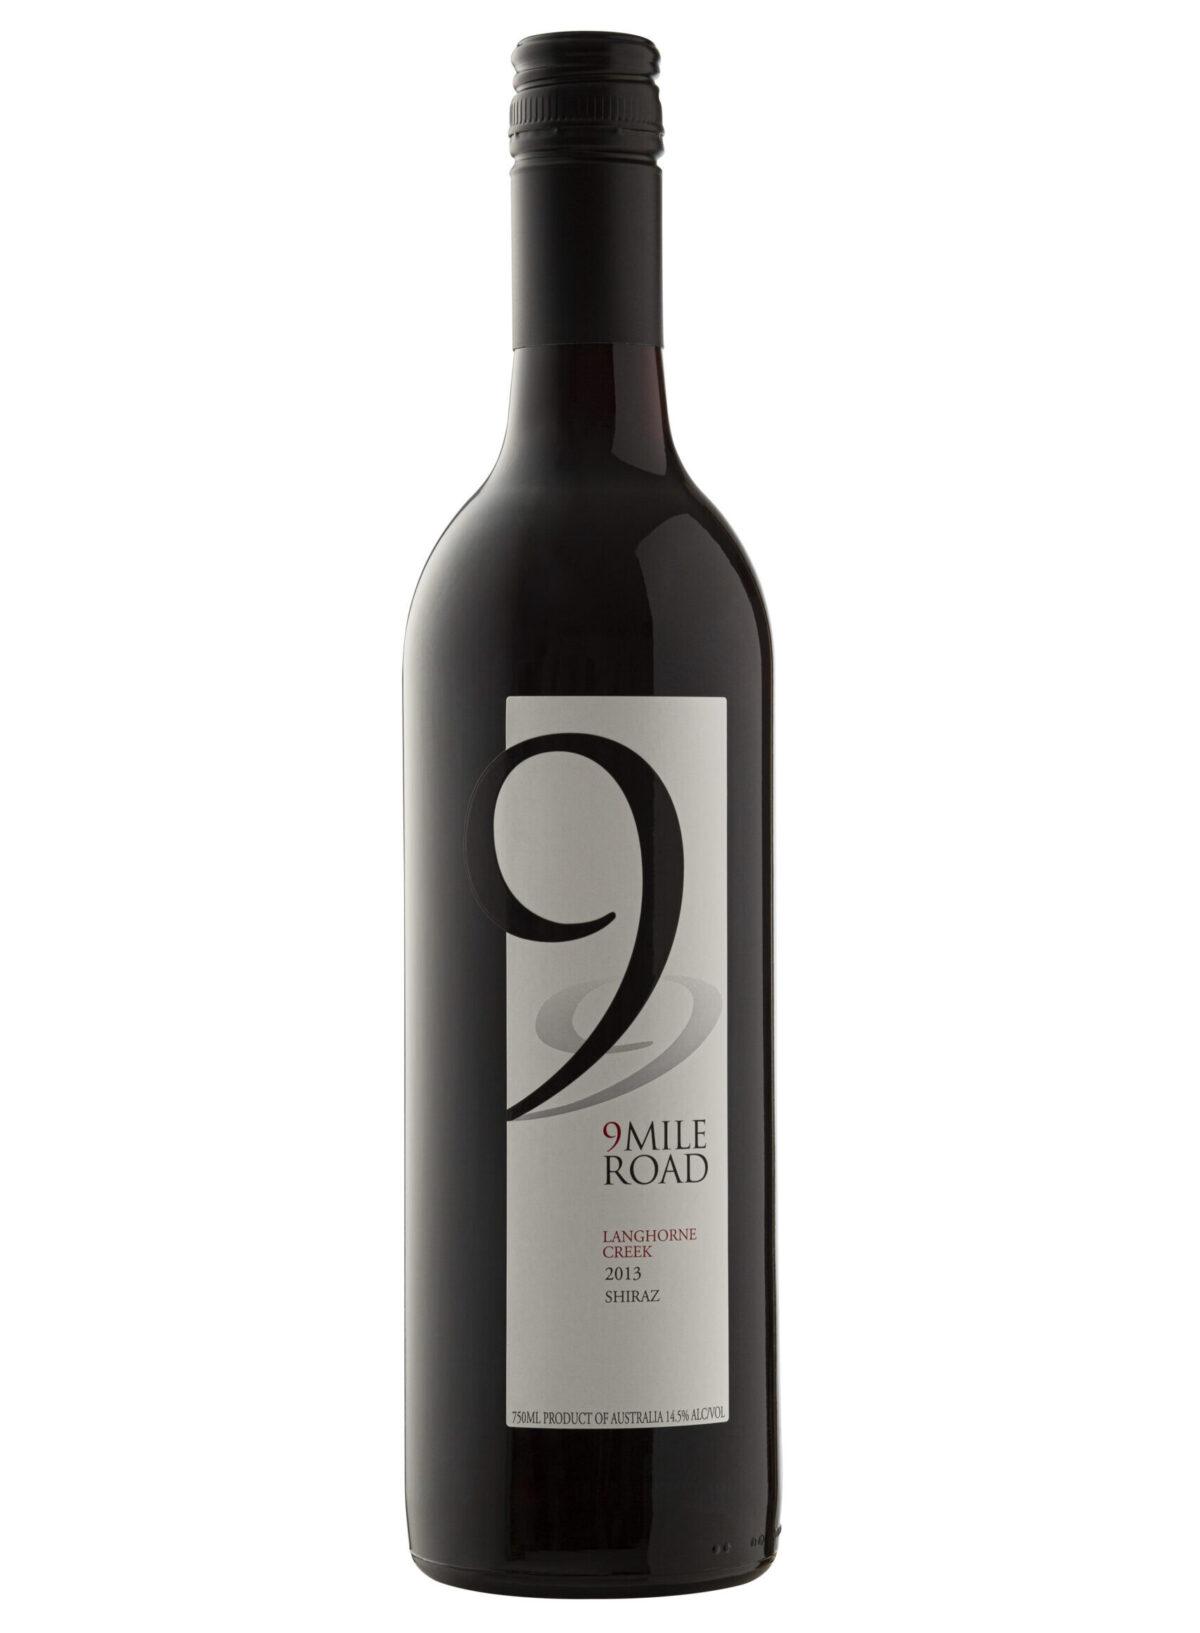 9 mile road wine bottle.